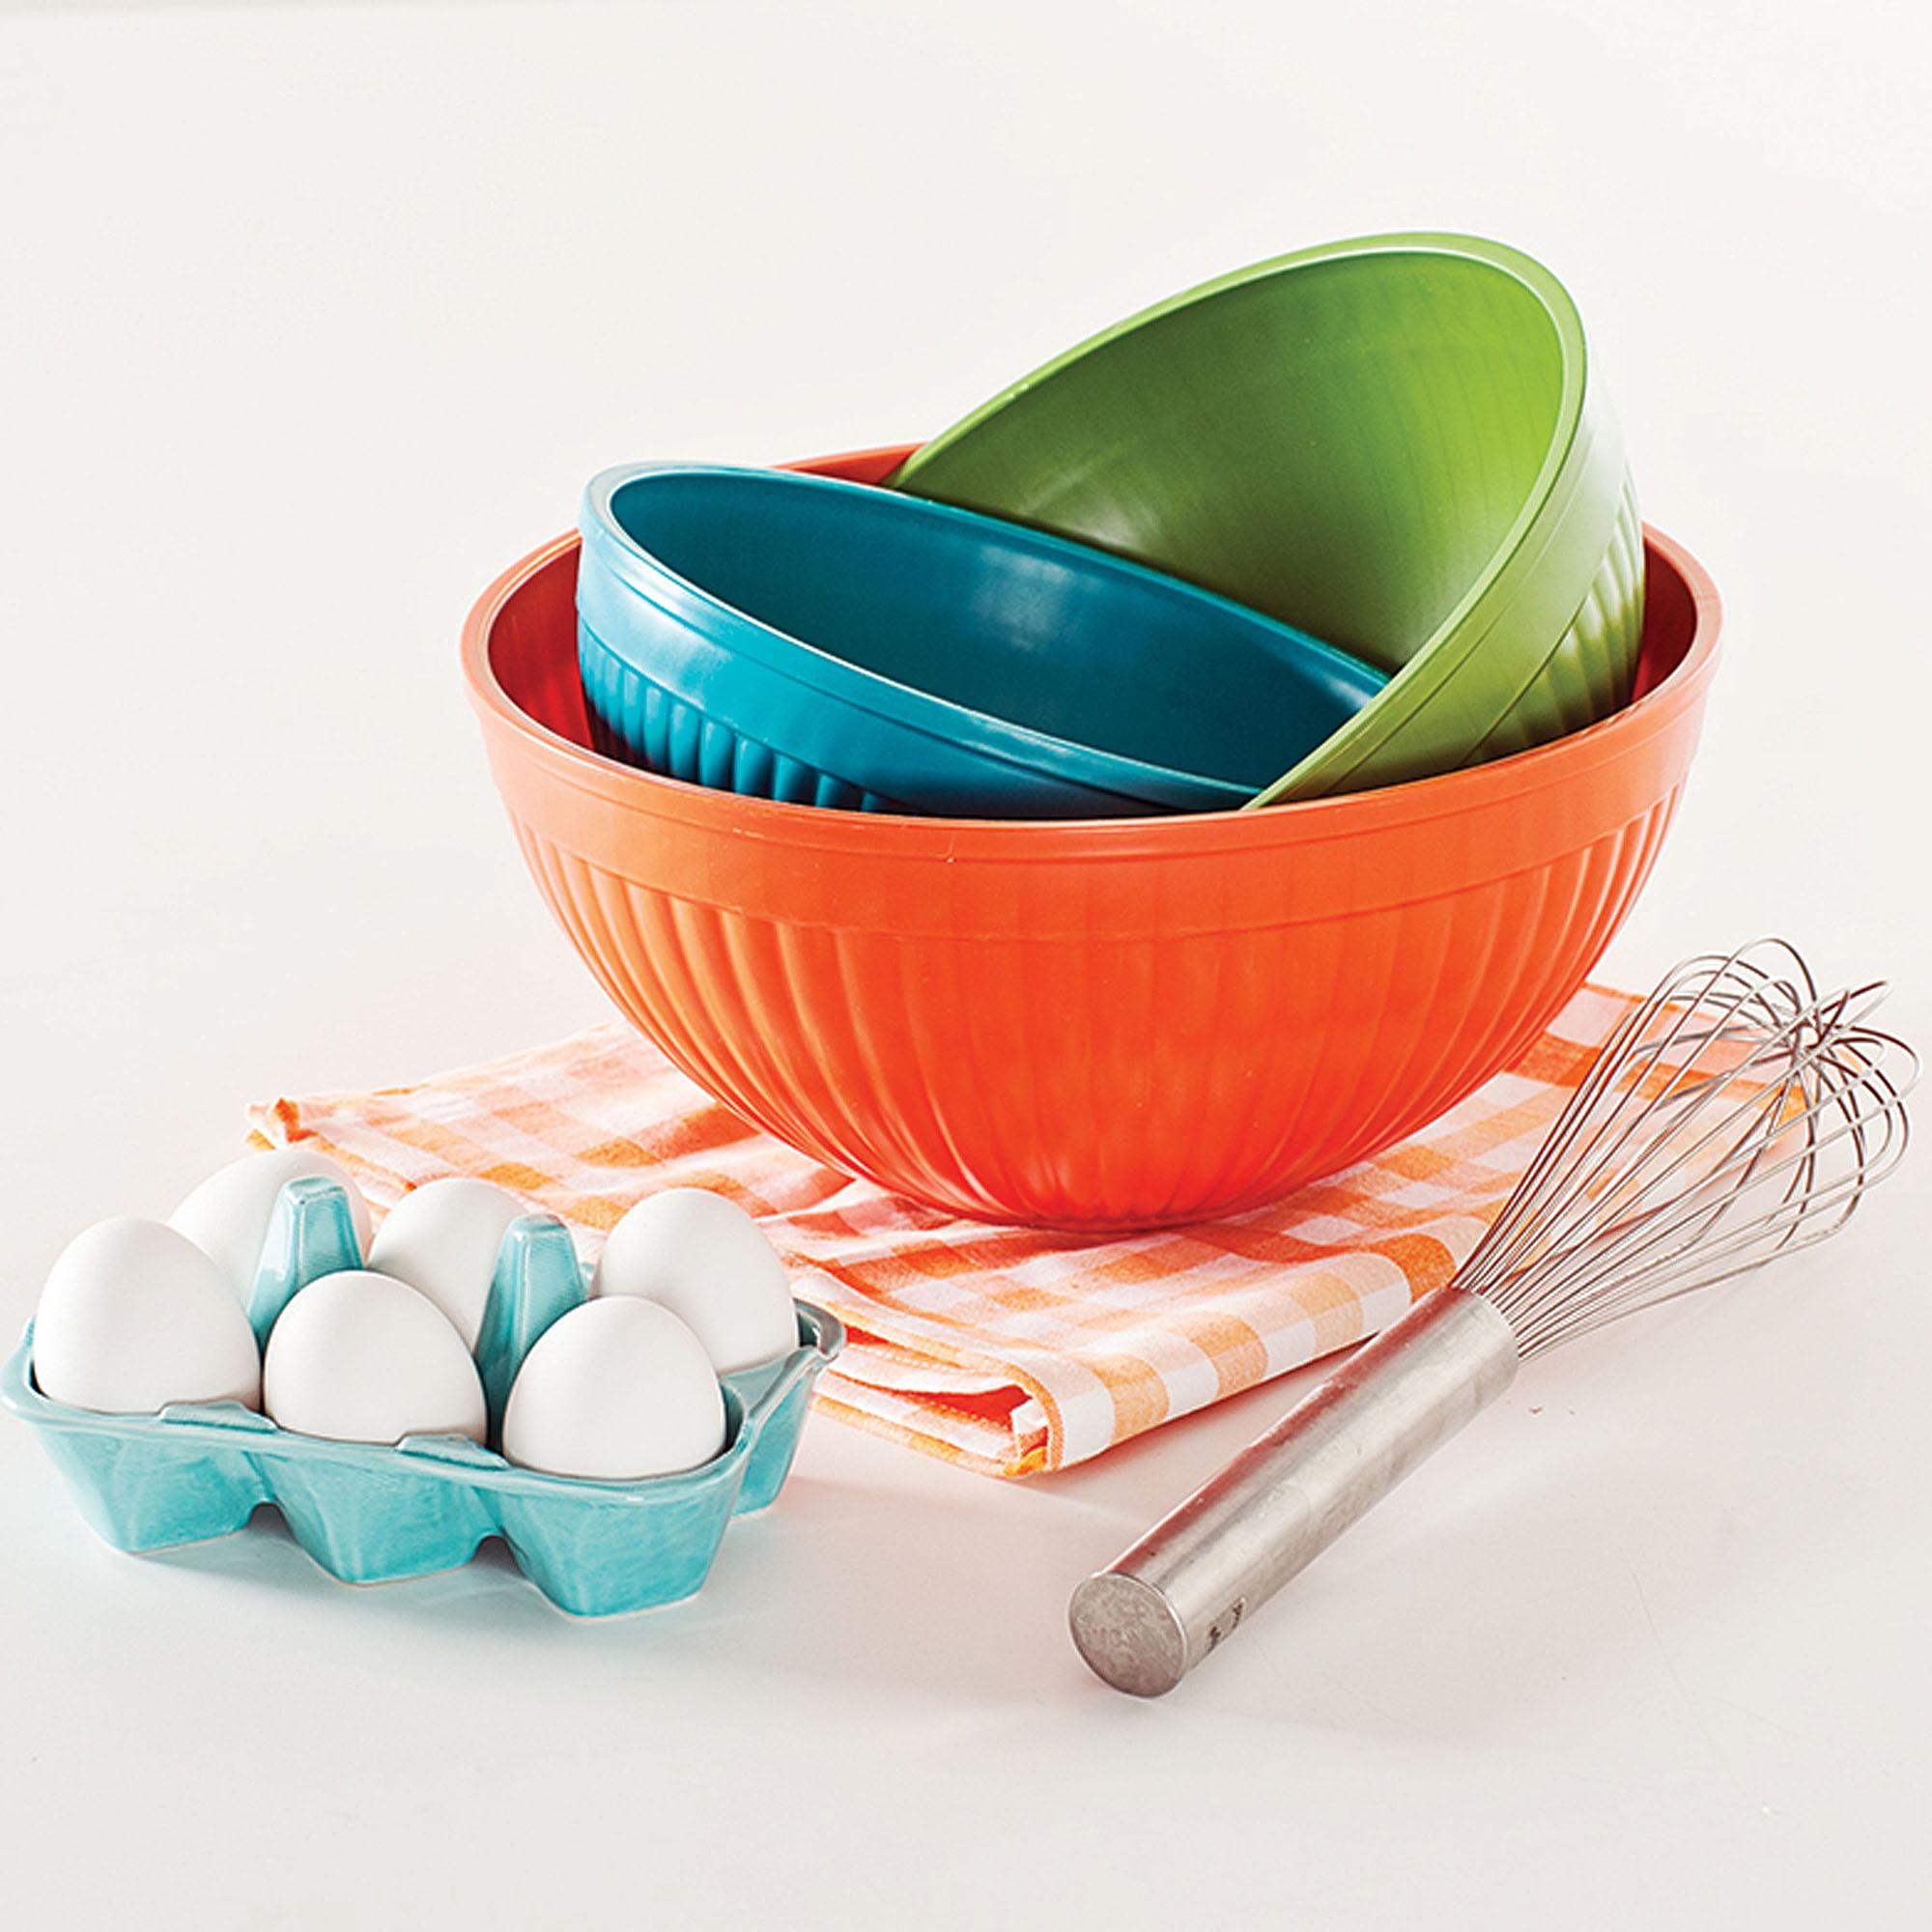 Nordic Ware Set of 3 Prep n' Serve Bowls